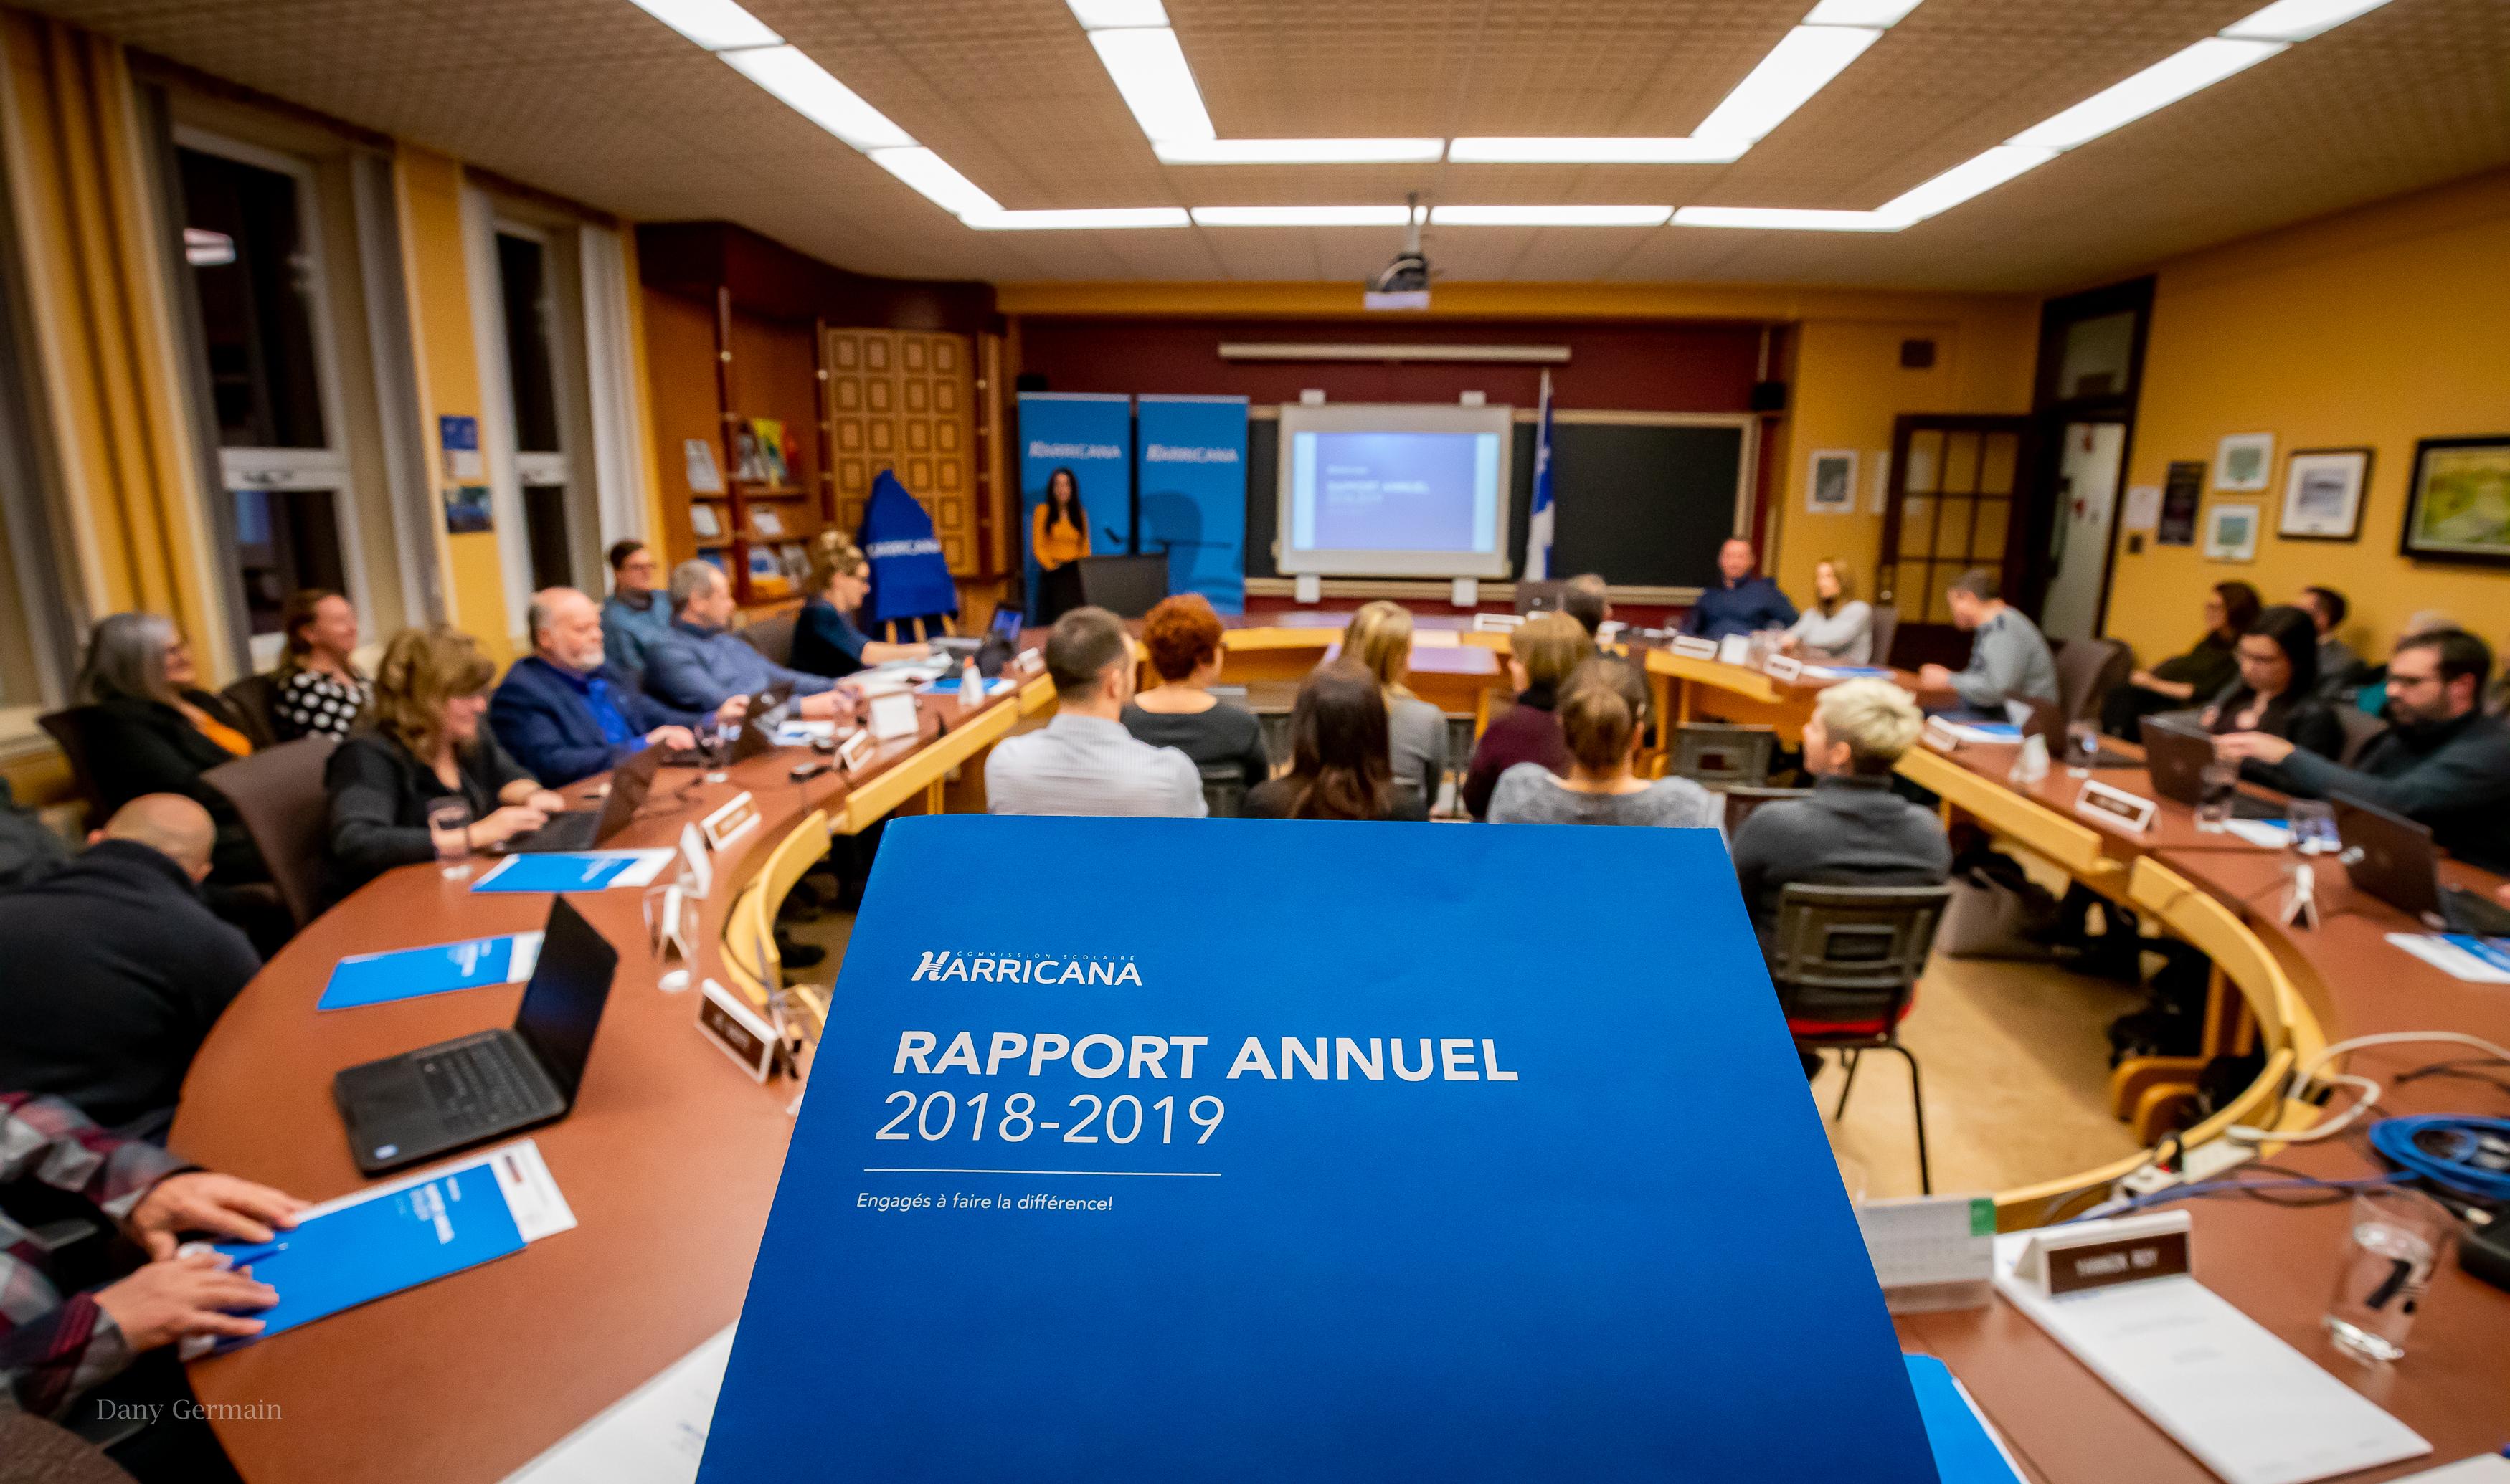 CSH rapport annuel Harricana